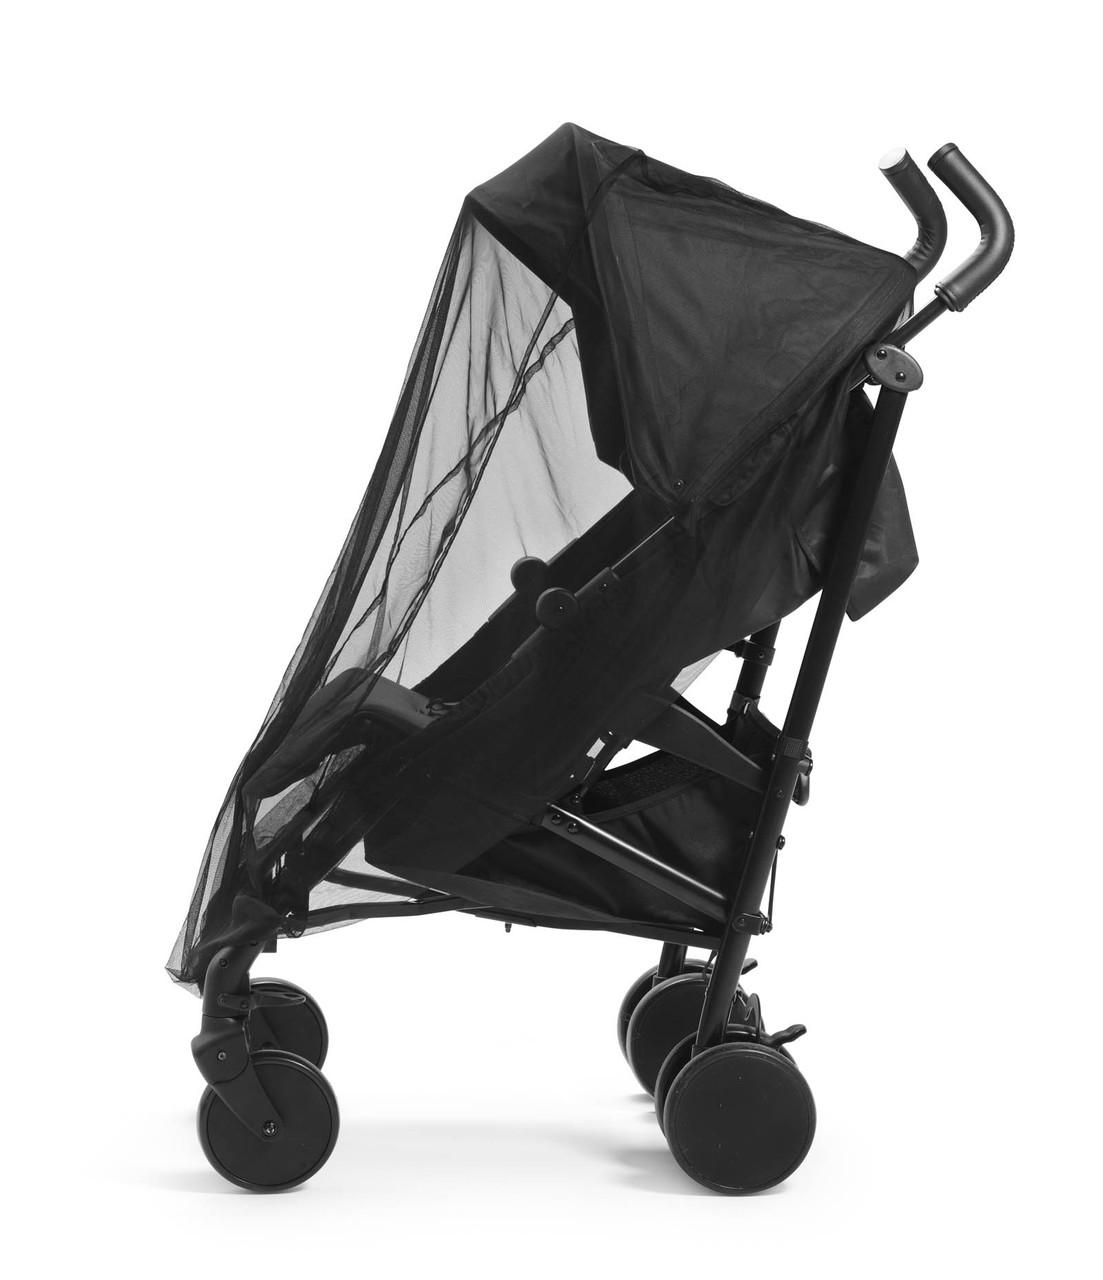 Elodie Details - Антимоскитная сетка для коляски, Brilliant Black